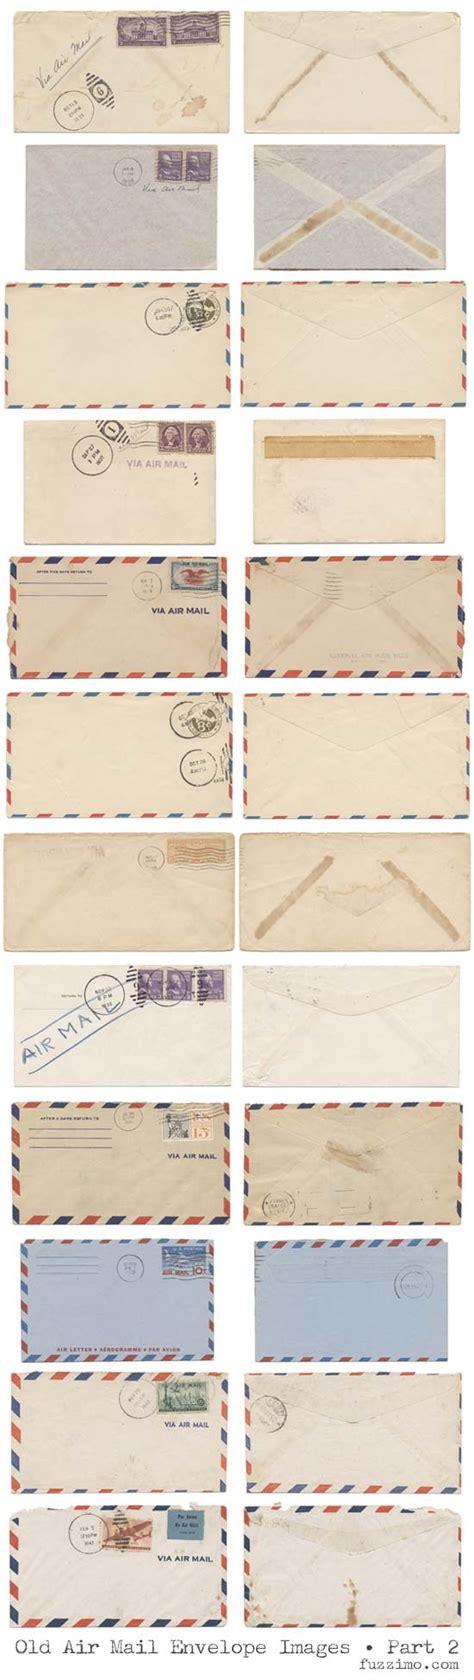 airmail envelope printable free hi res old air mail envelope images 2 fuzzimo